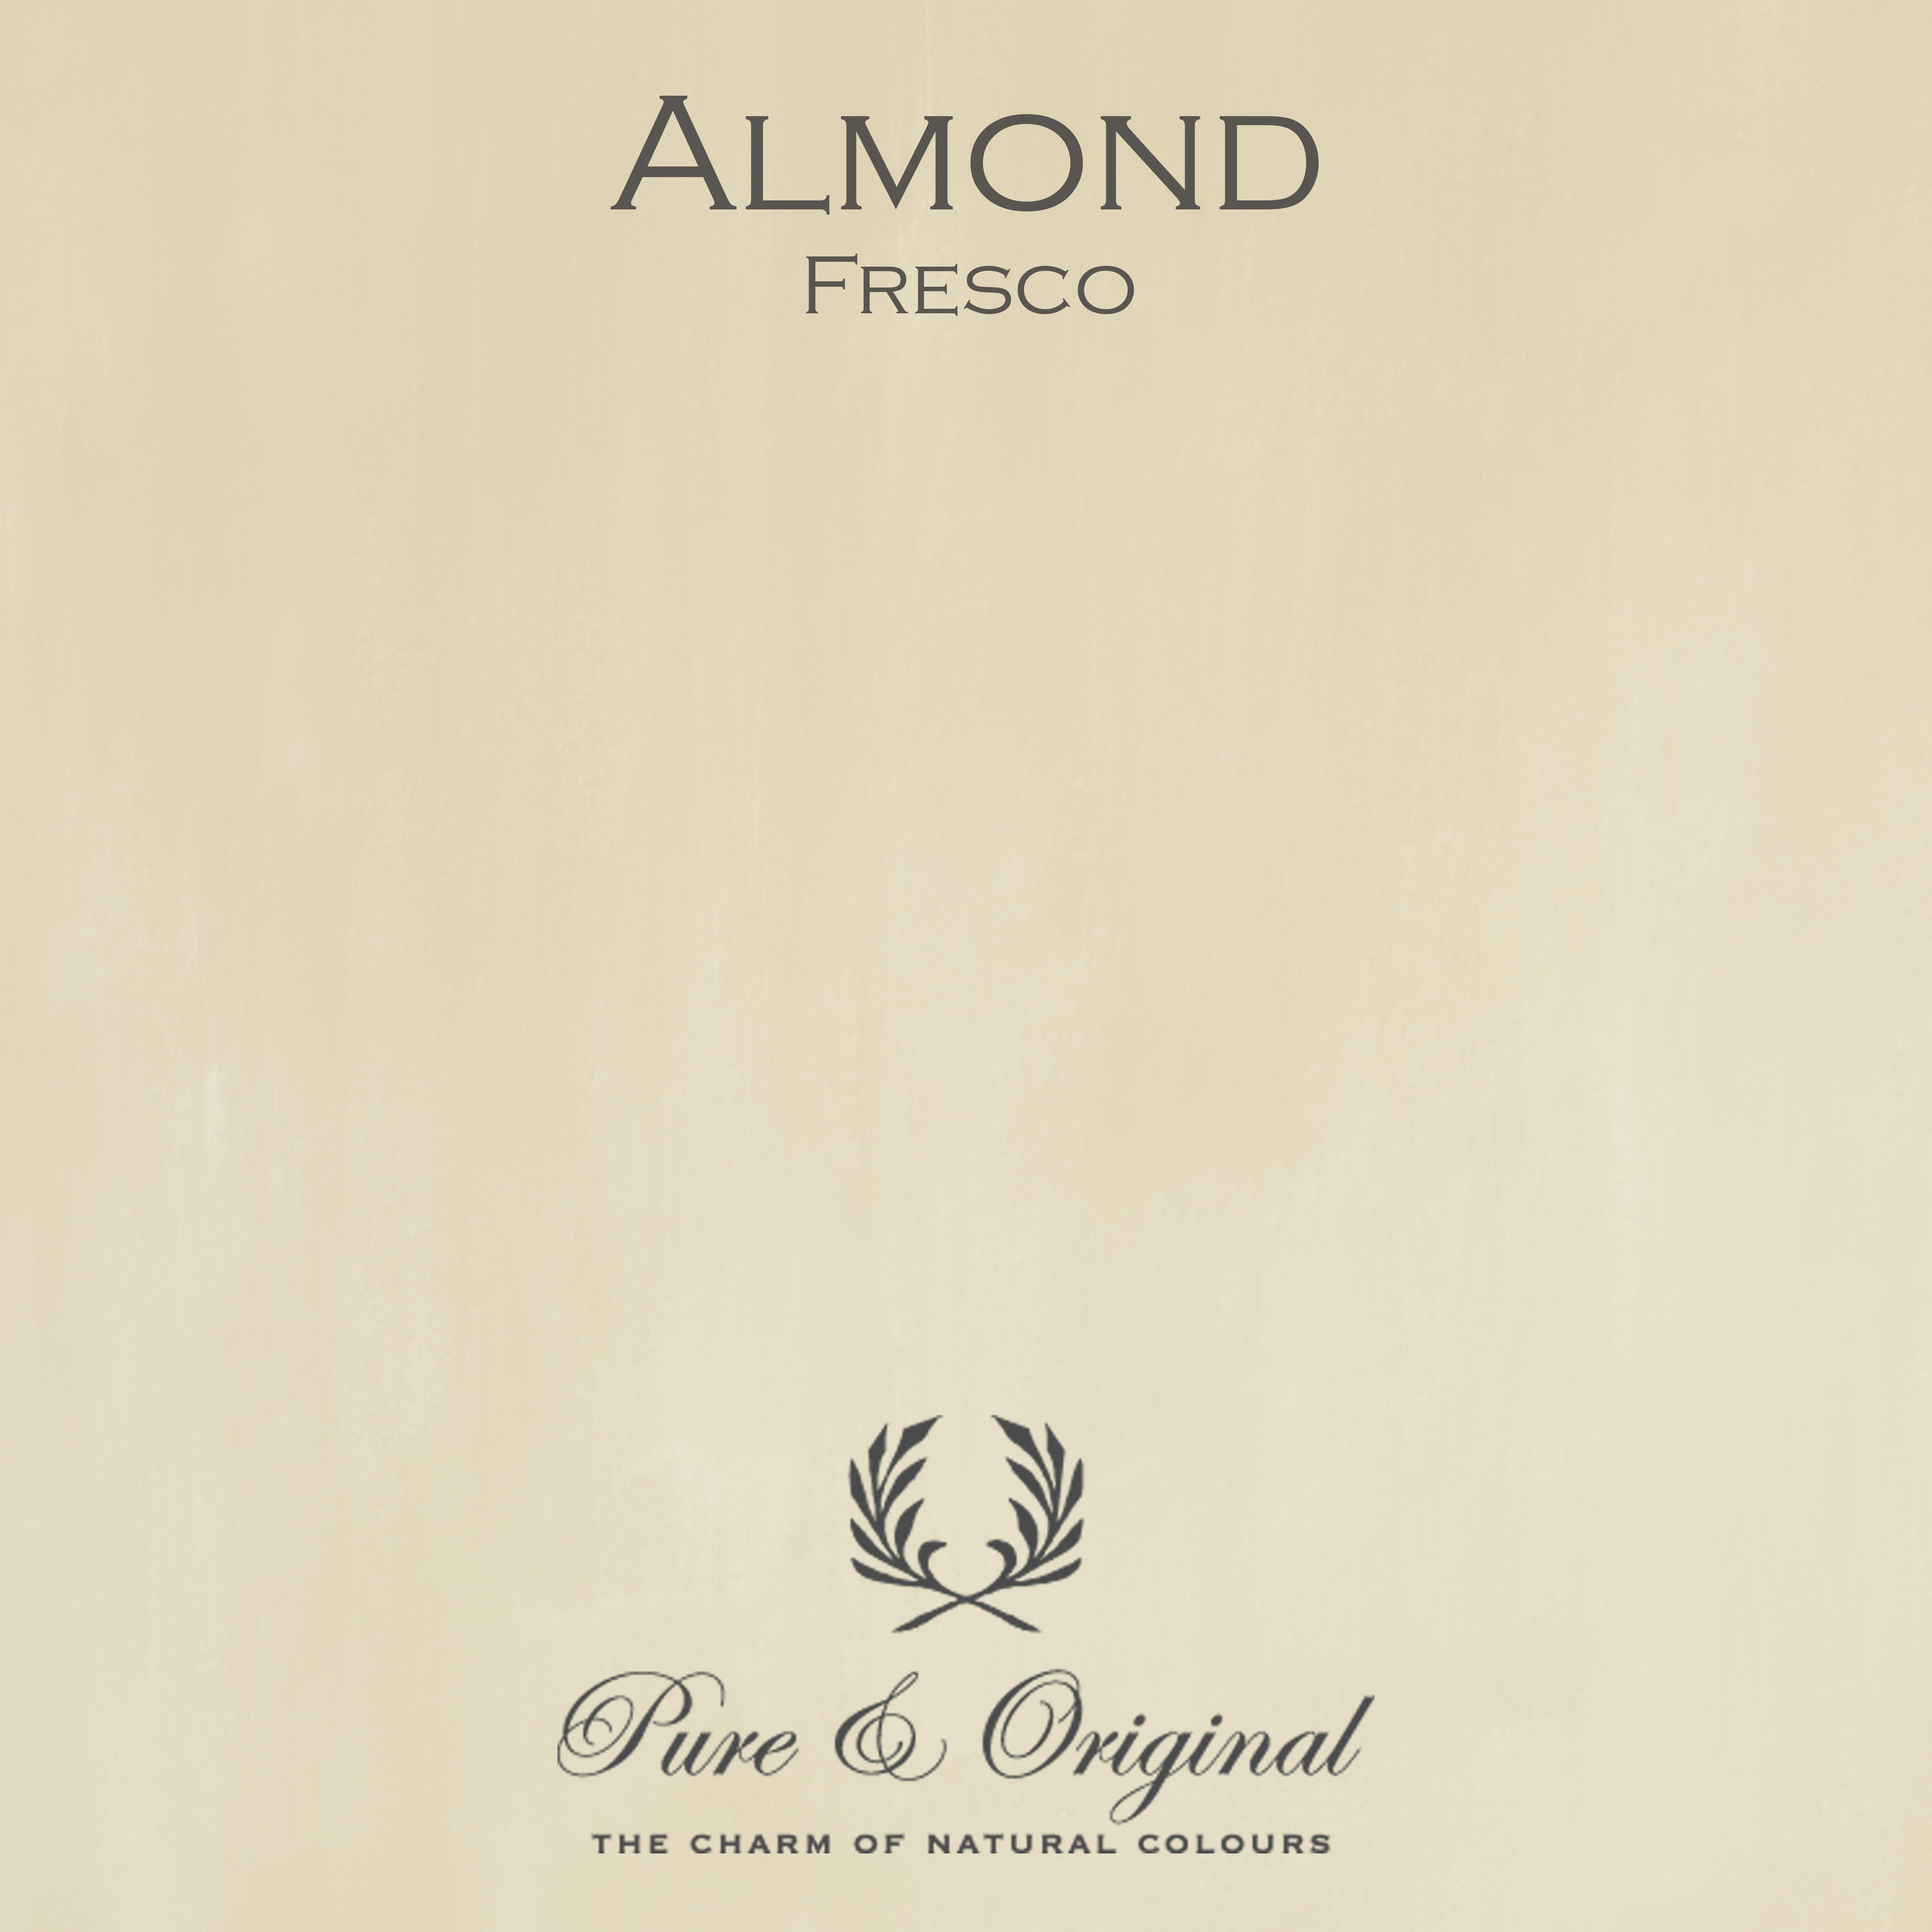 Kulör Almond, Fresco kalkfärg